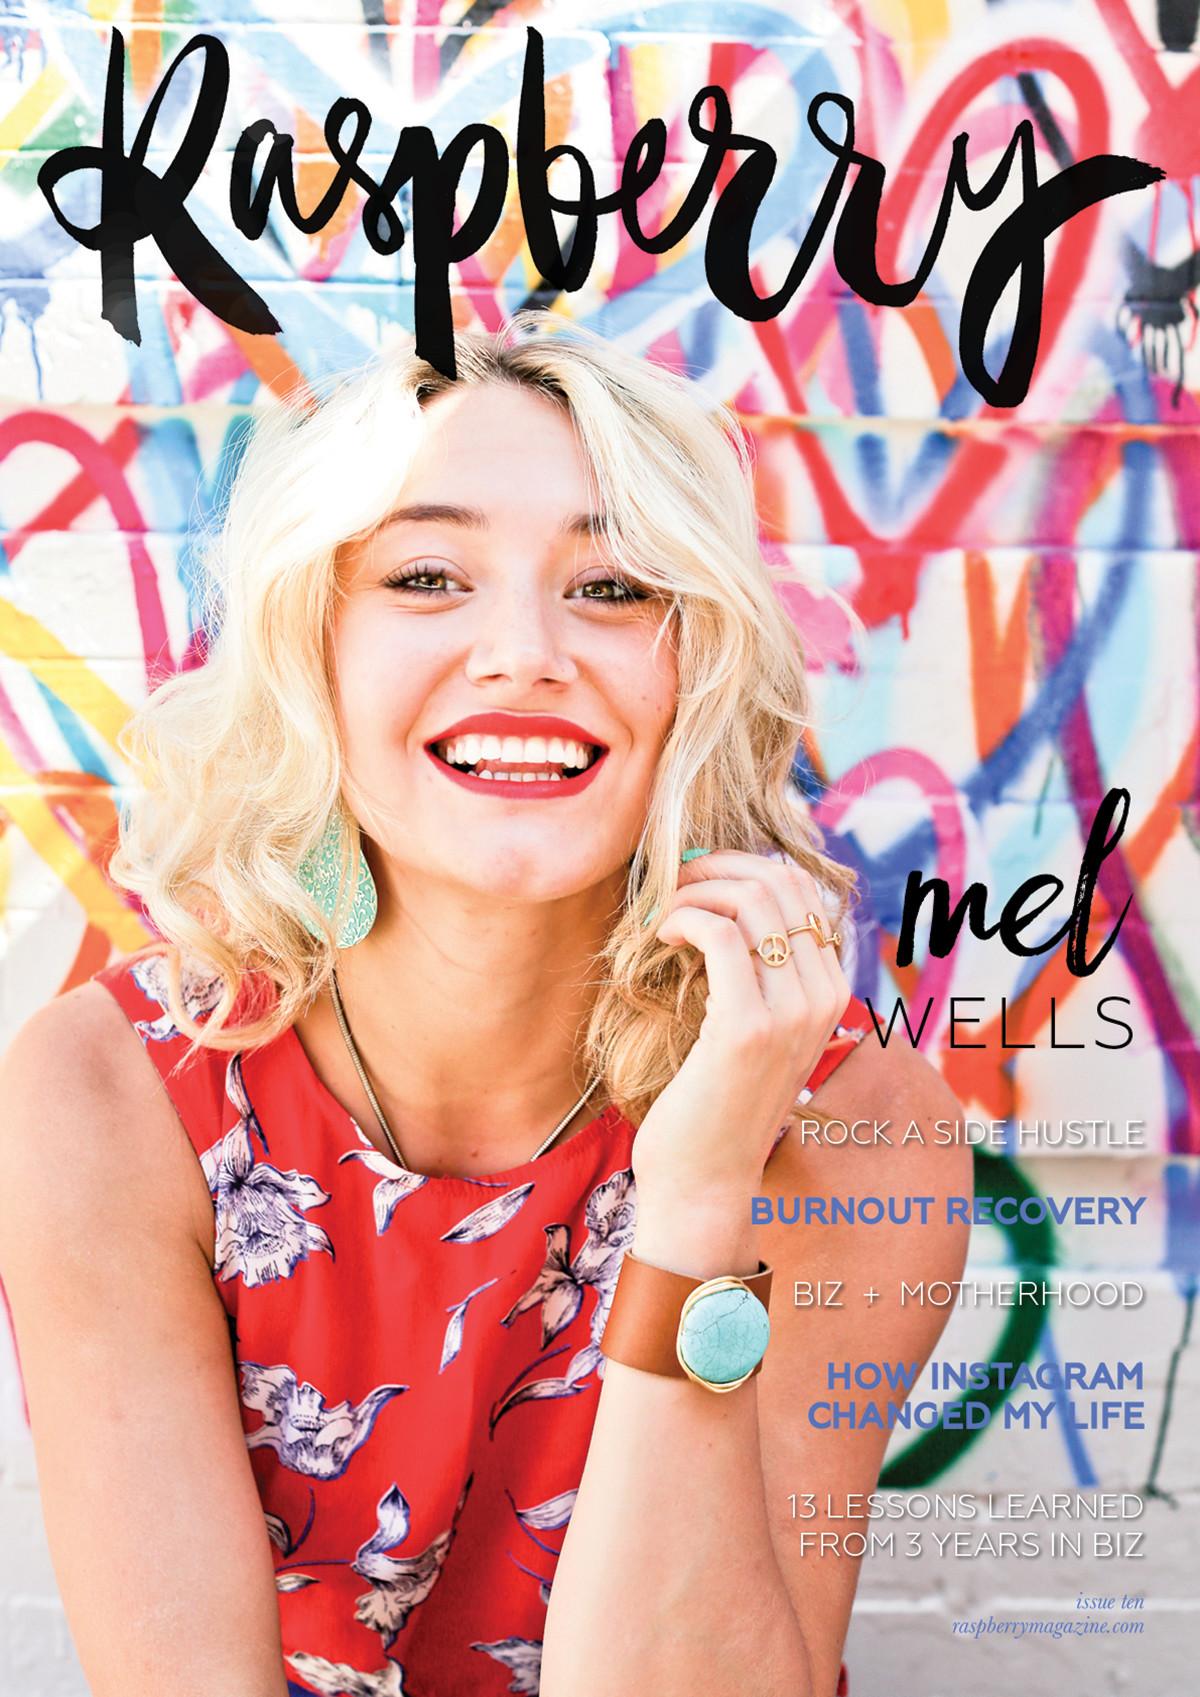 Raspberry Magazine Issue 10 Mel Wells.jpg